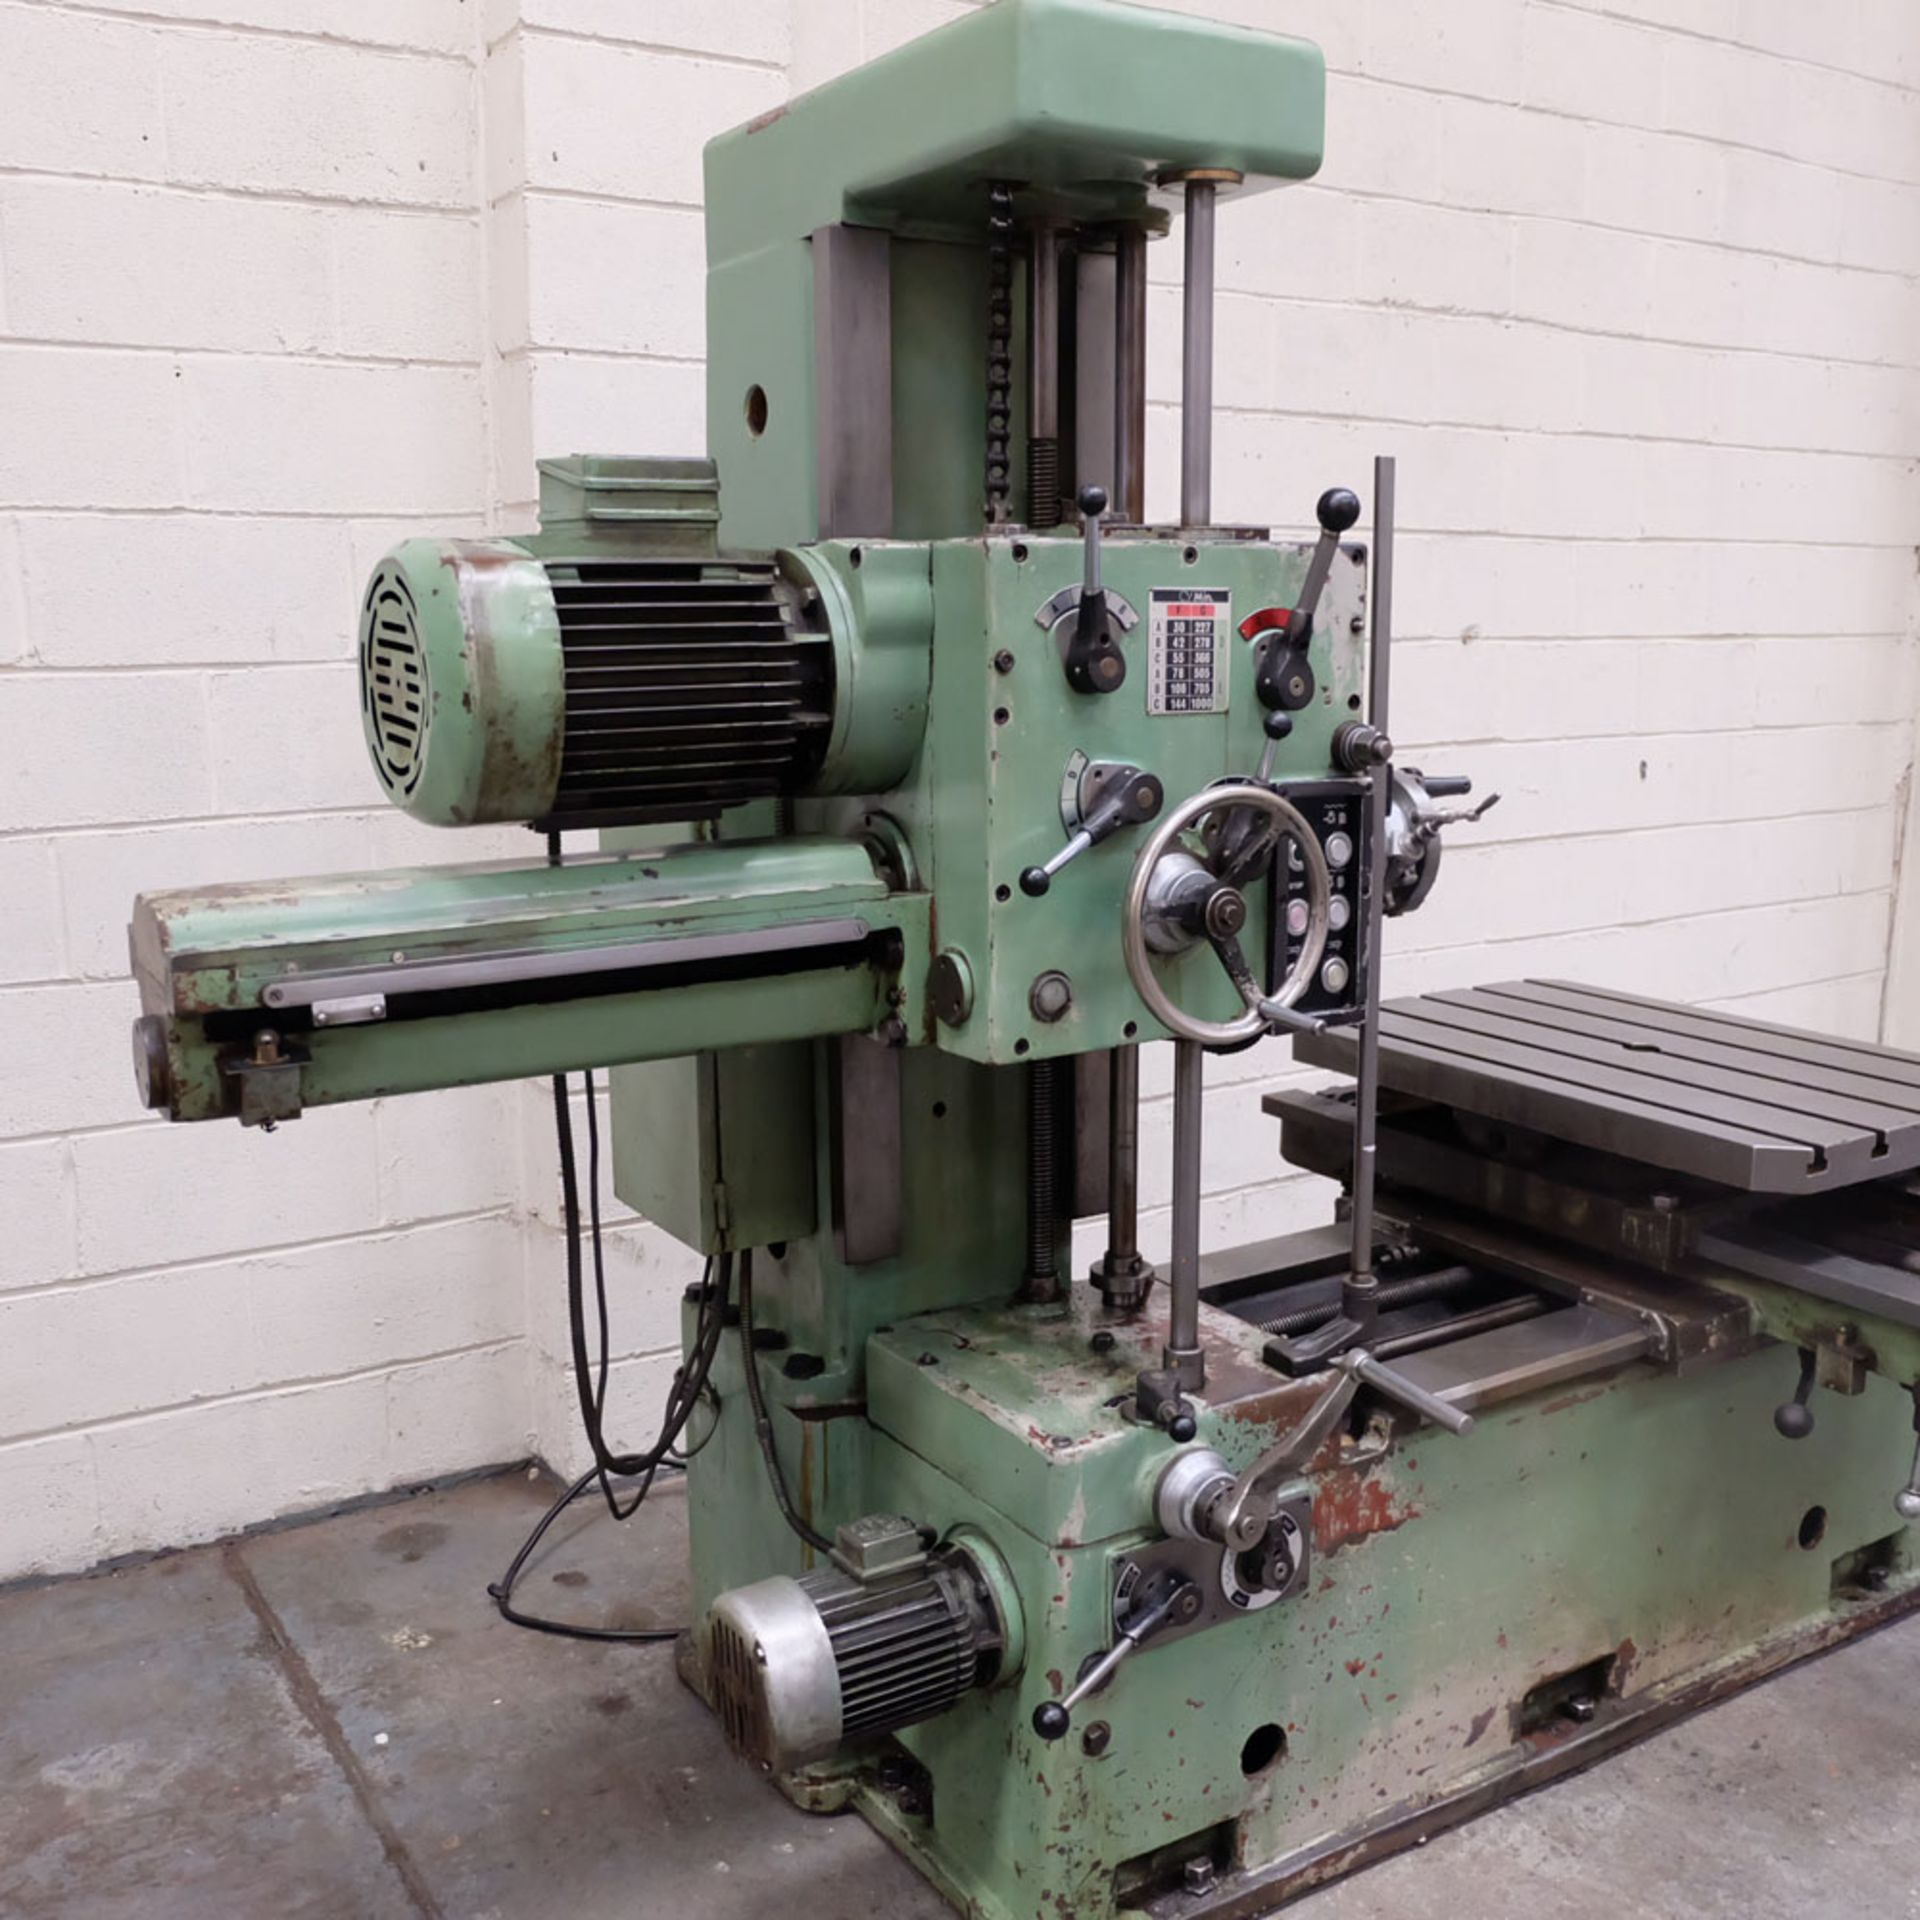 Juaristi Model MDR-55 Horizontal Boring Machine. Spindle Size: 55mm Dia. Spindle Bore: No.4 MT. - Image 2 of 14